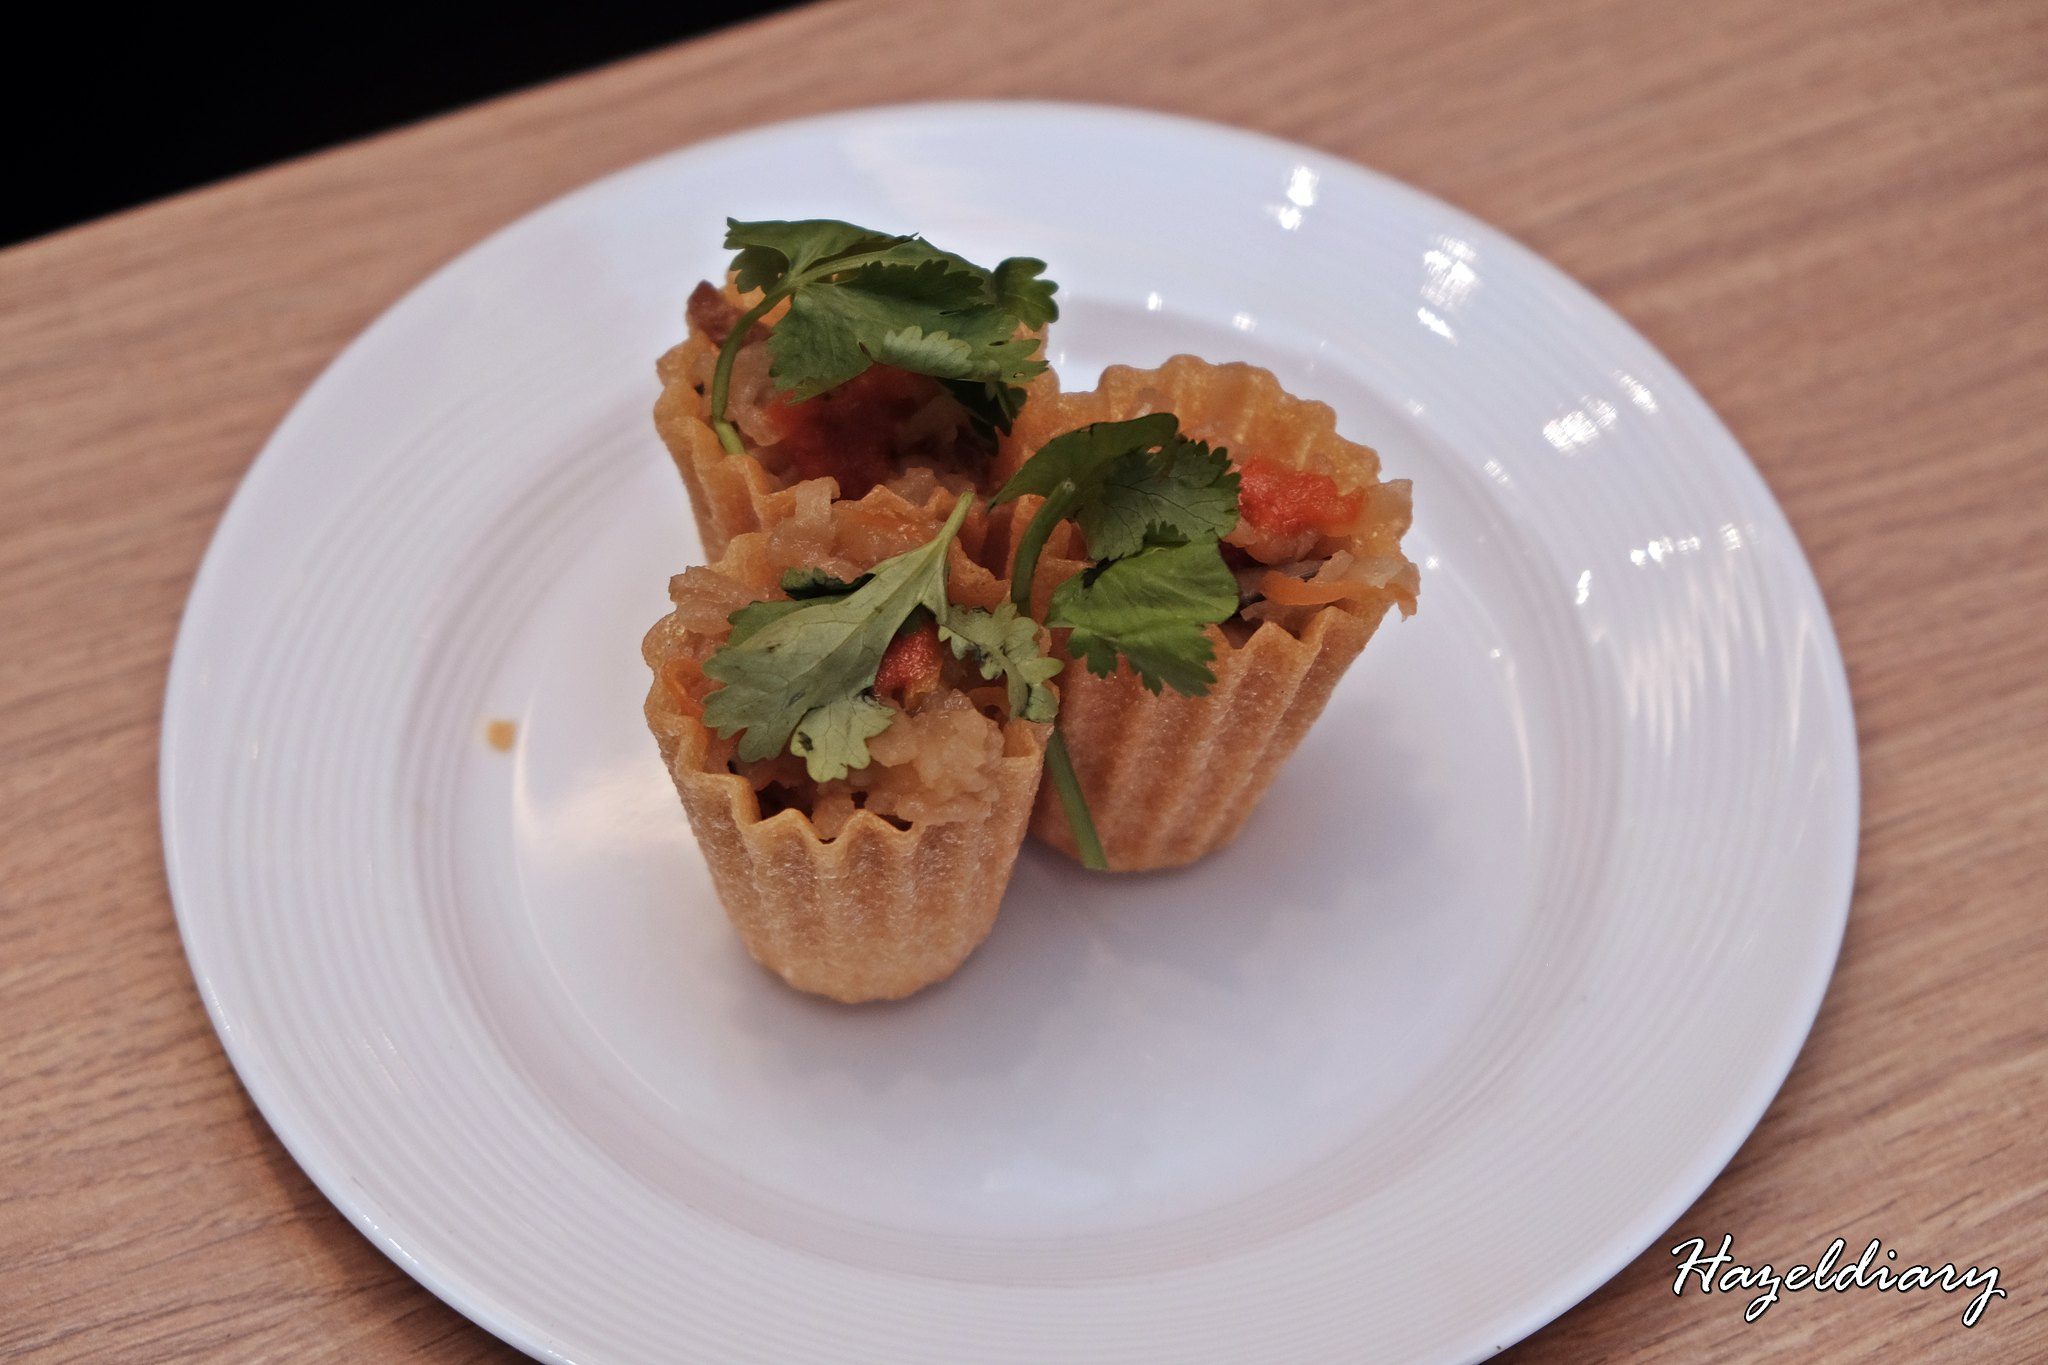 Penang Food Fare Buffet-Sky22 Courtyard Marriott-Kueh Pie Tee